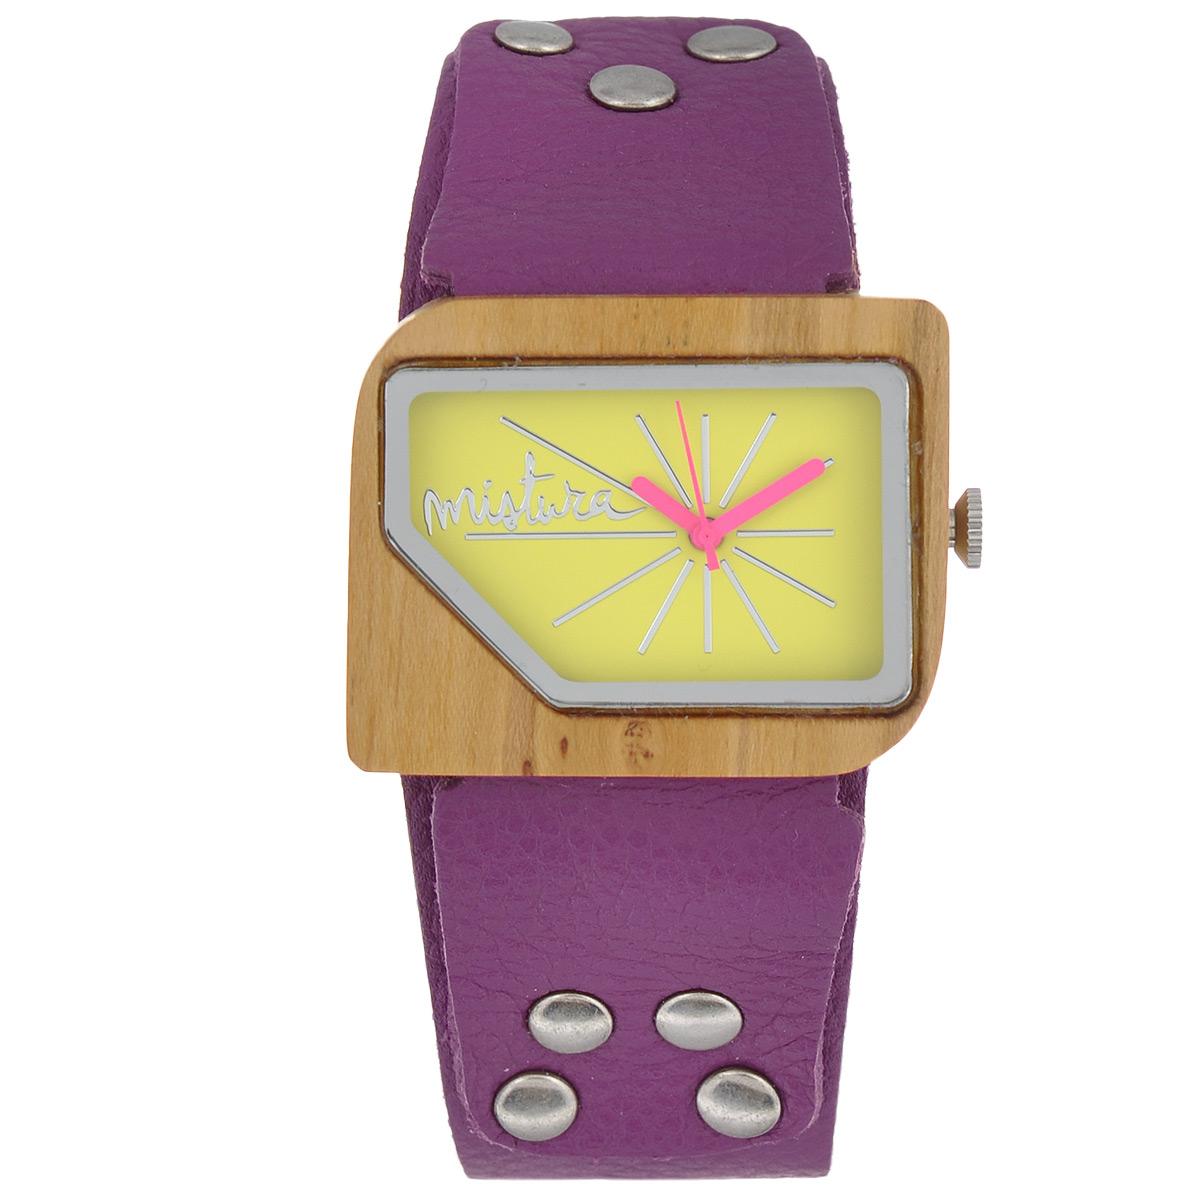 "Часы наручные женские Mistura ""Pellicano: Orchid Teak Yellow Neon"". TP09004ODTKYLWD ( TP09004ODTKYLWD )"